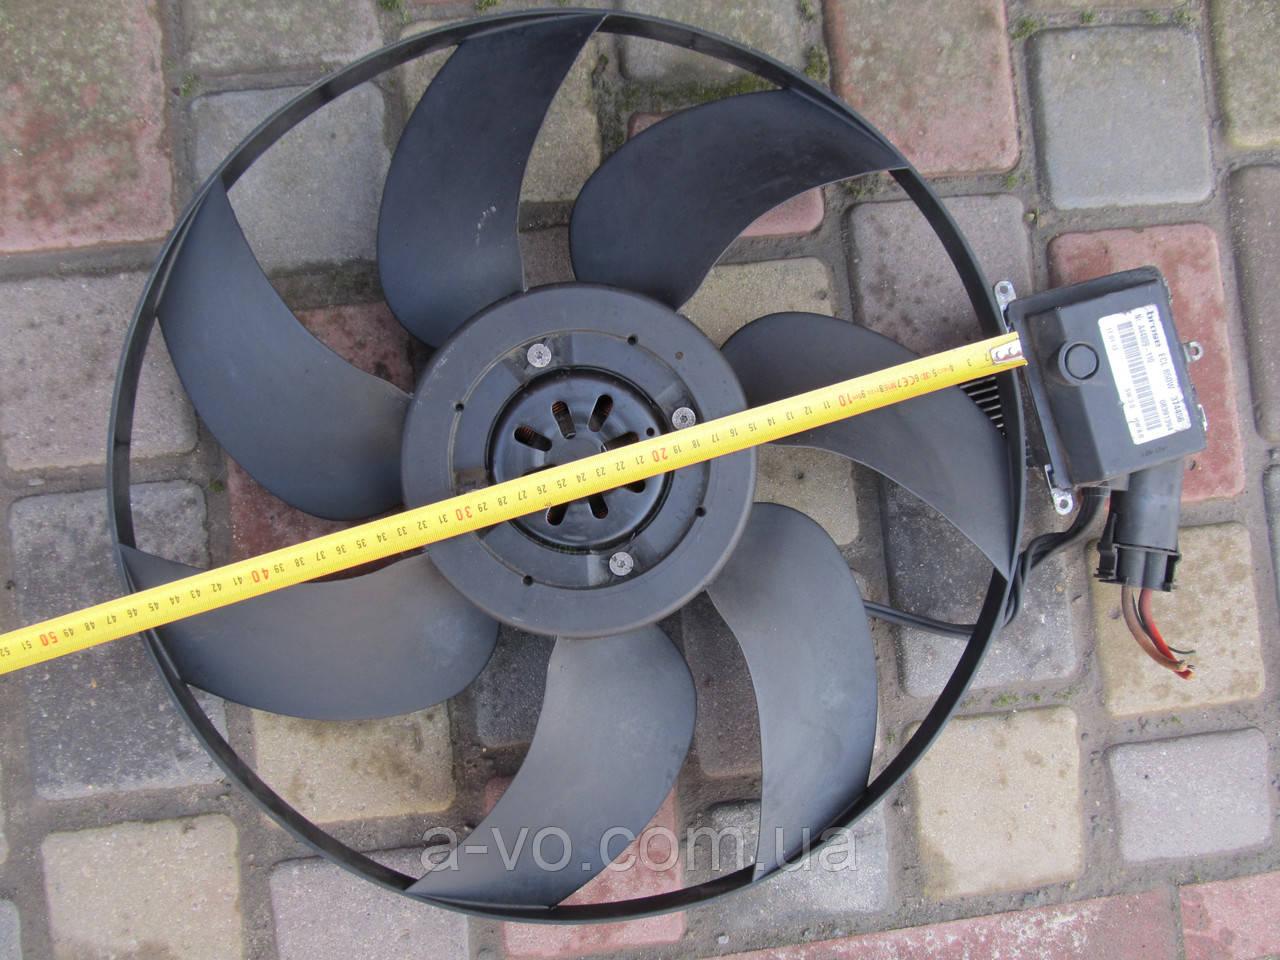 Вентилятор основного радиатора для Mercedes C Klass W203 C200 600W, A2035000293KZ, 908004492, 374456